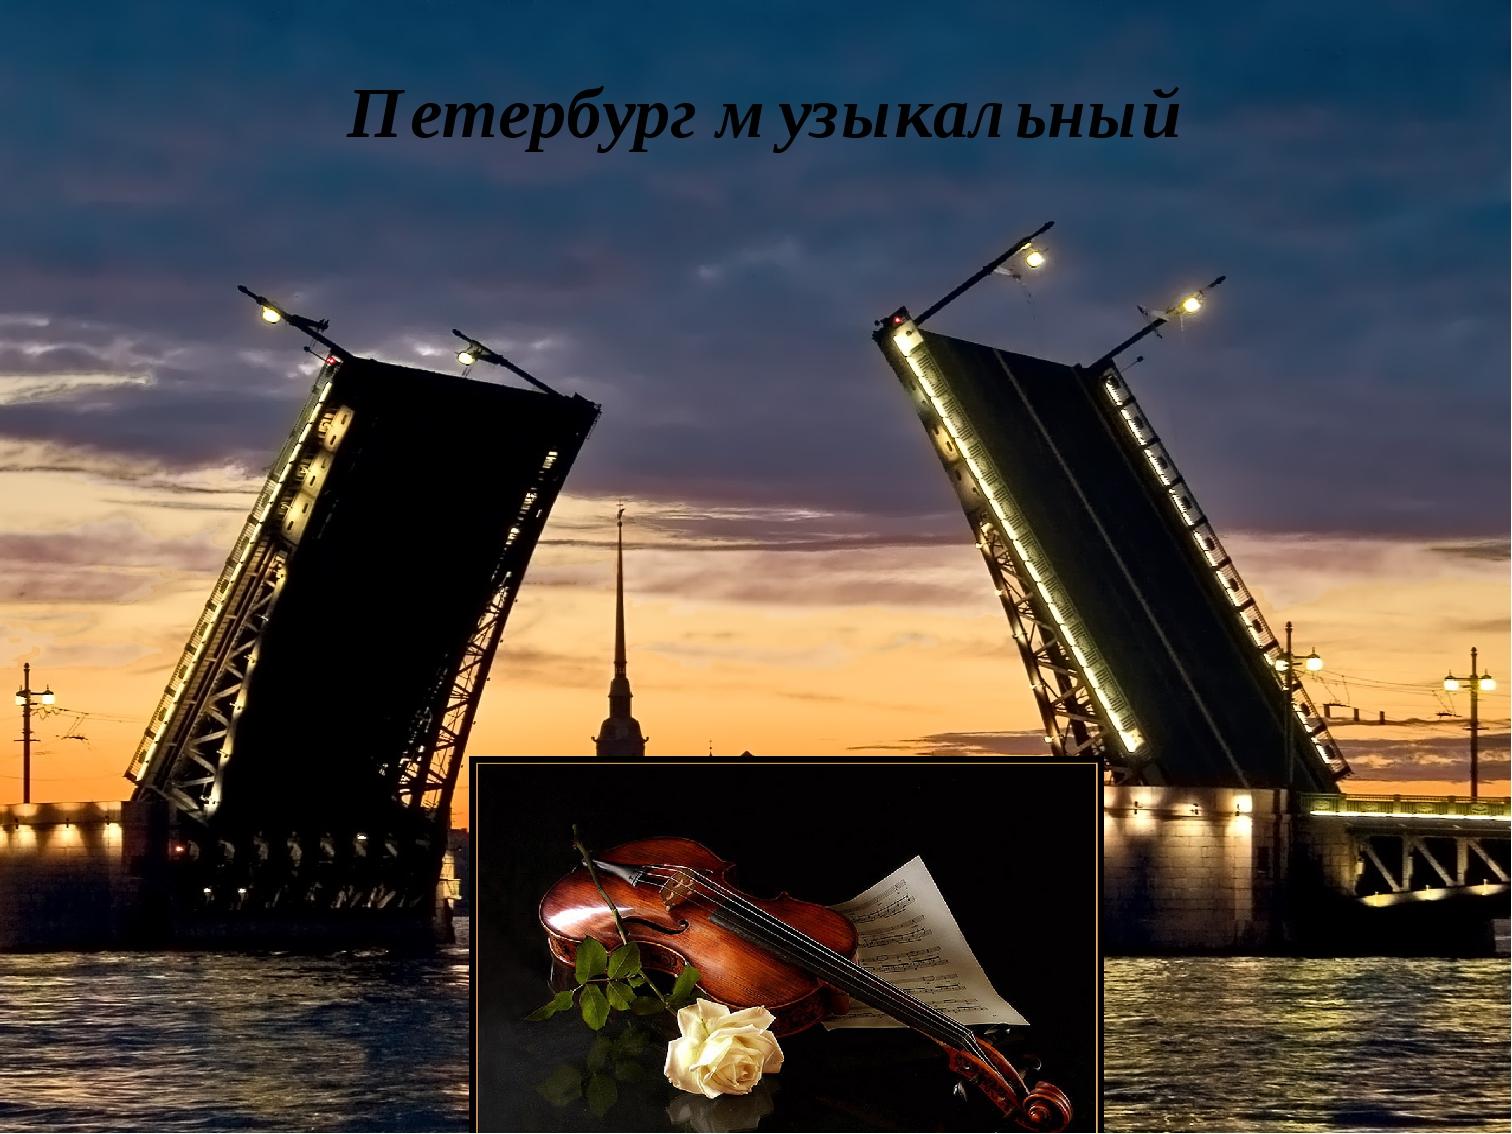 Петербург музыкальный